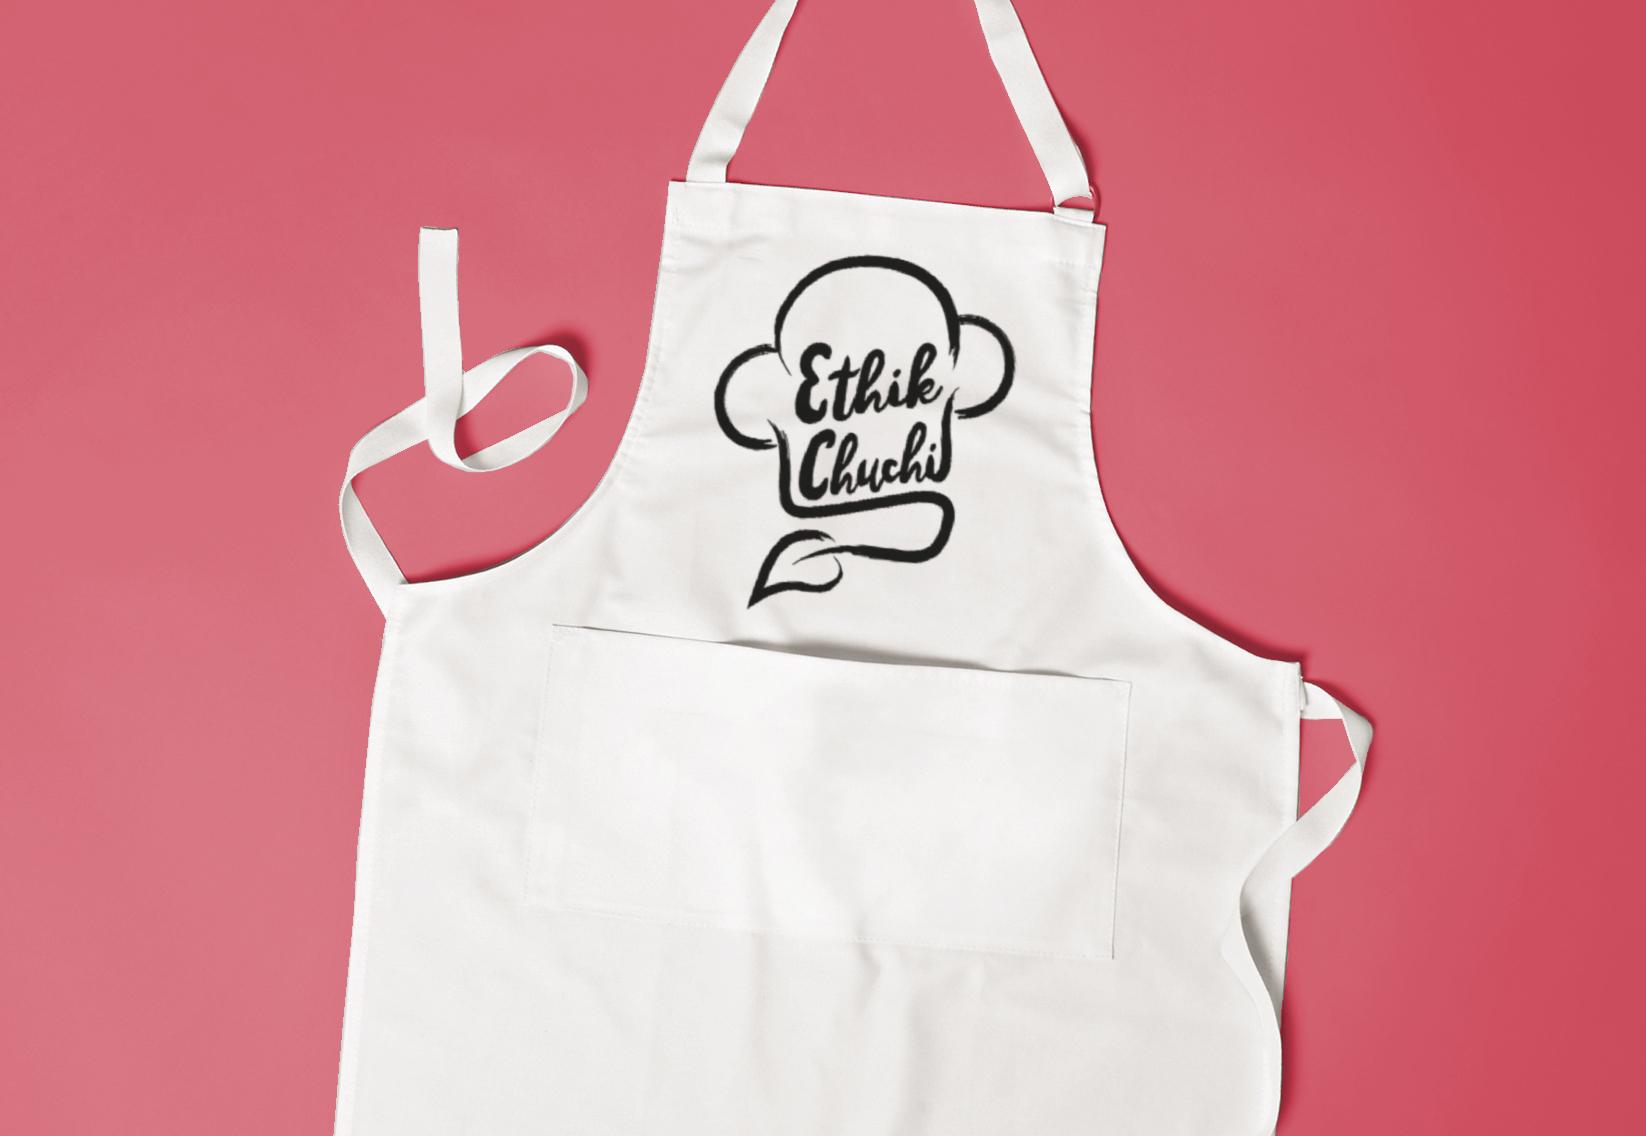 Ethik_Chuchi_Logo_design_schuerze_02.jpg